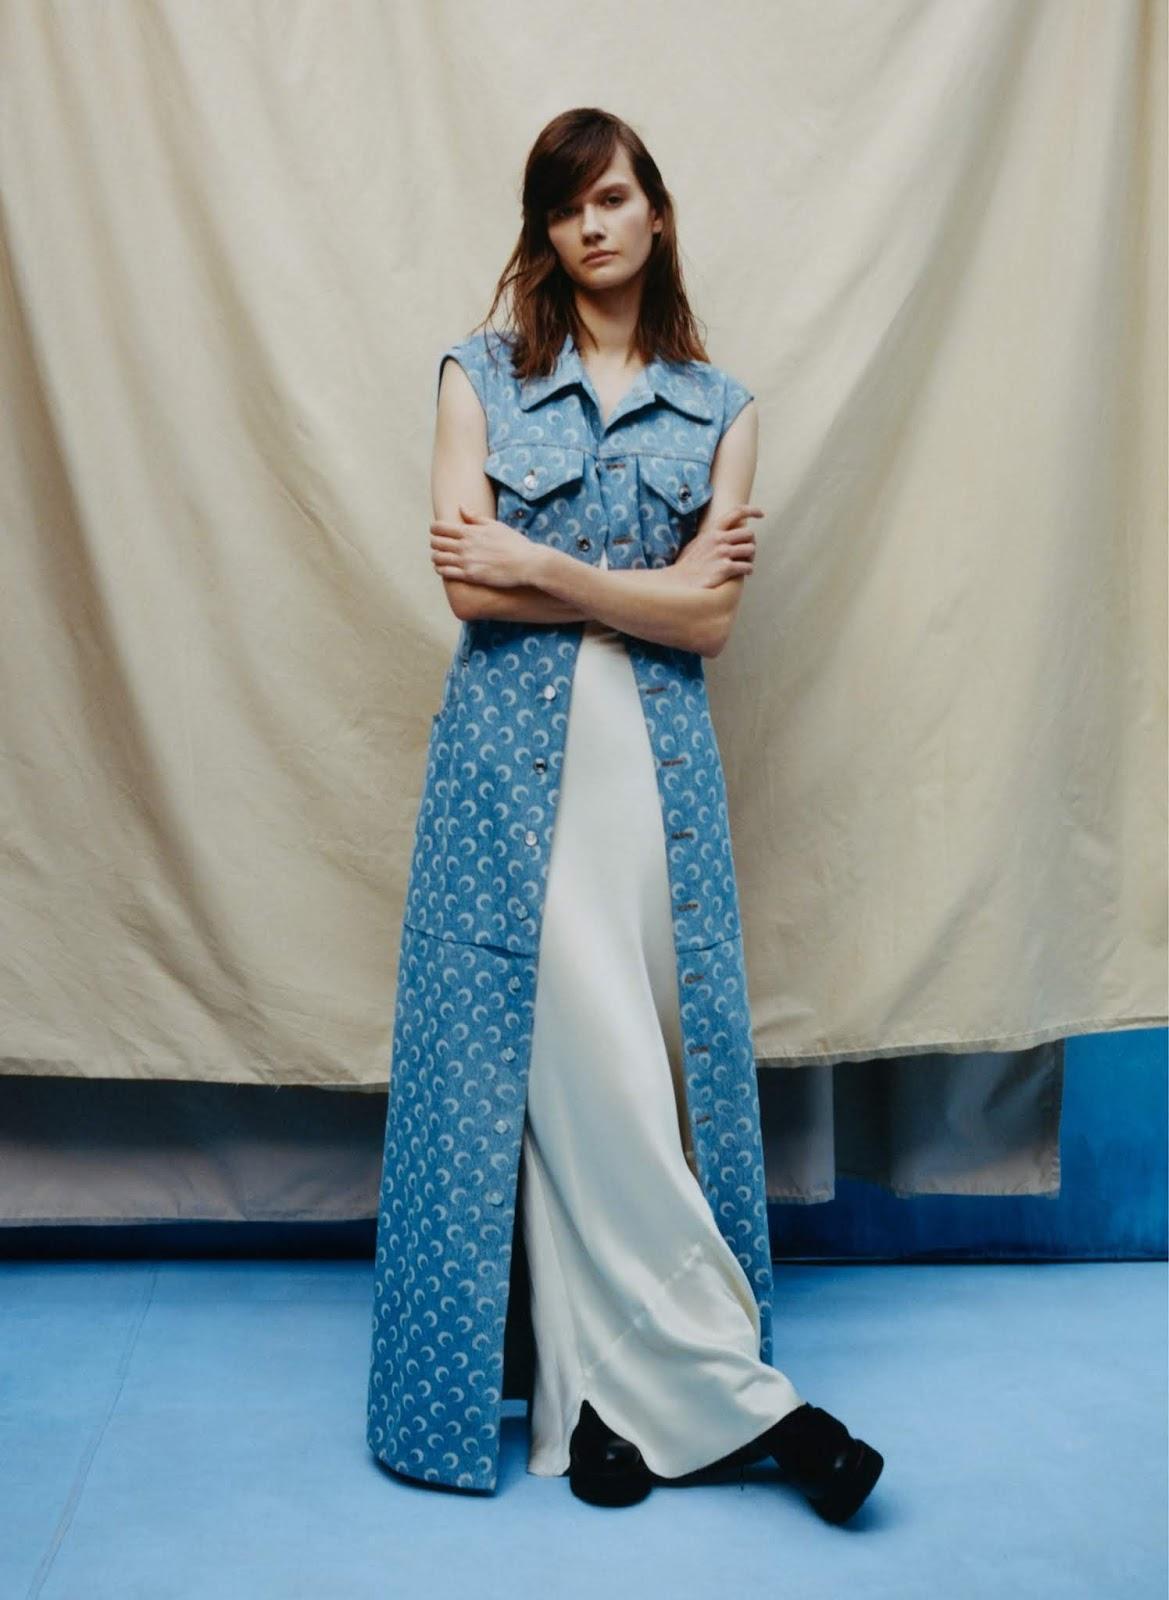 Daniela Kocianova - Nili Lotan silk slip. Marine Serre vest. R13 boots. Photographed by Tyler Mitchell, Vogue, April 2020